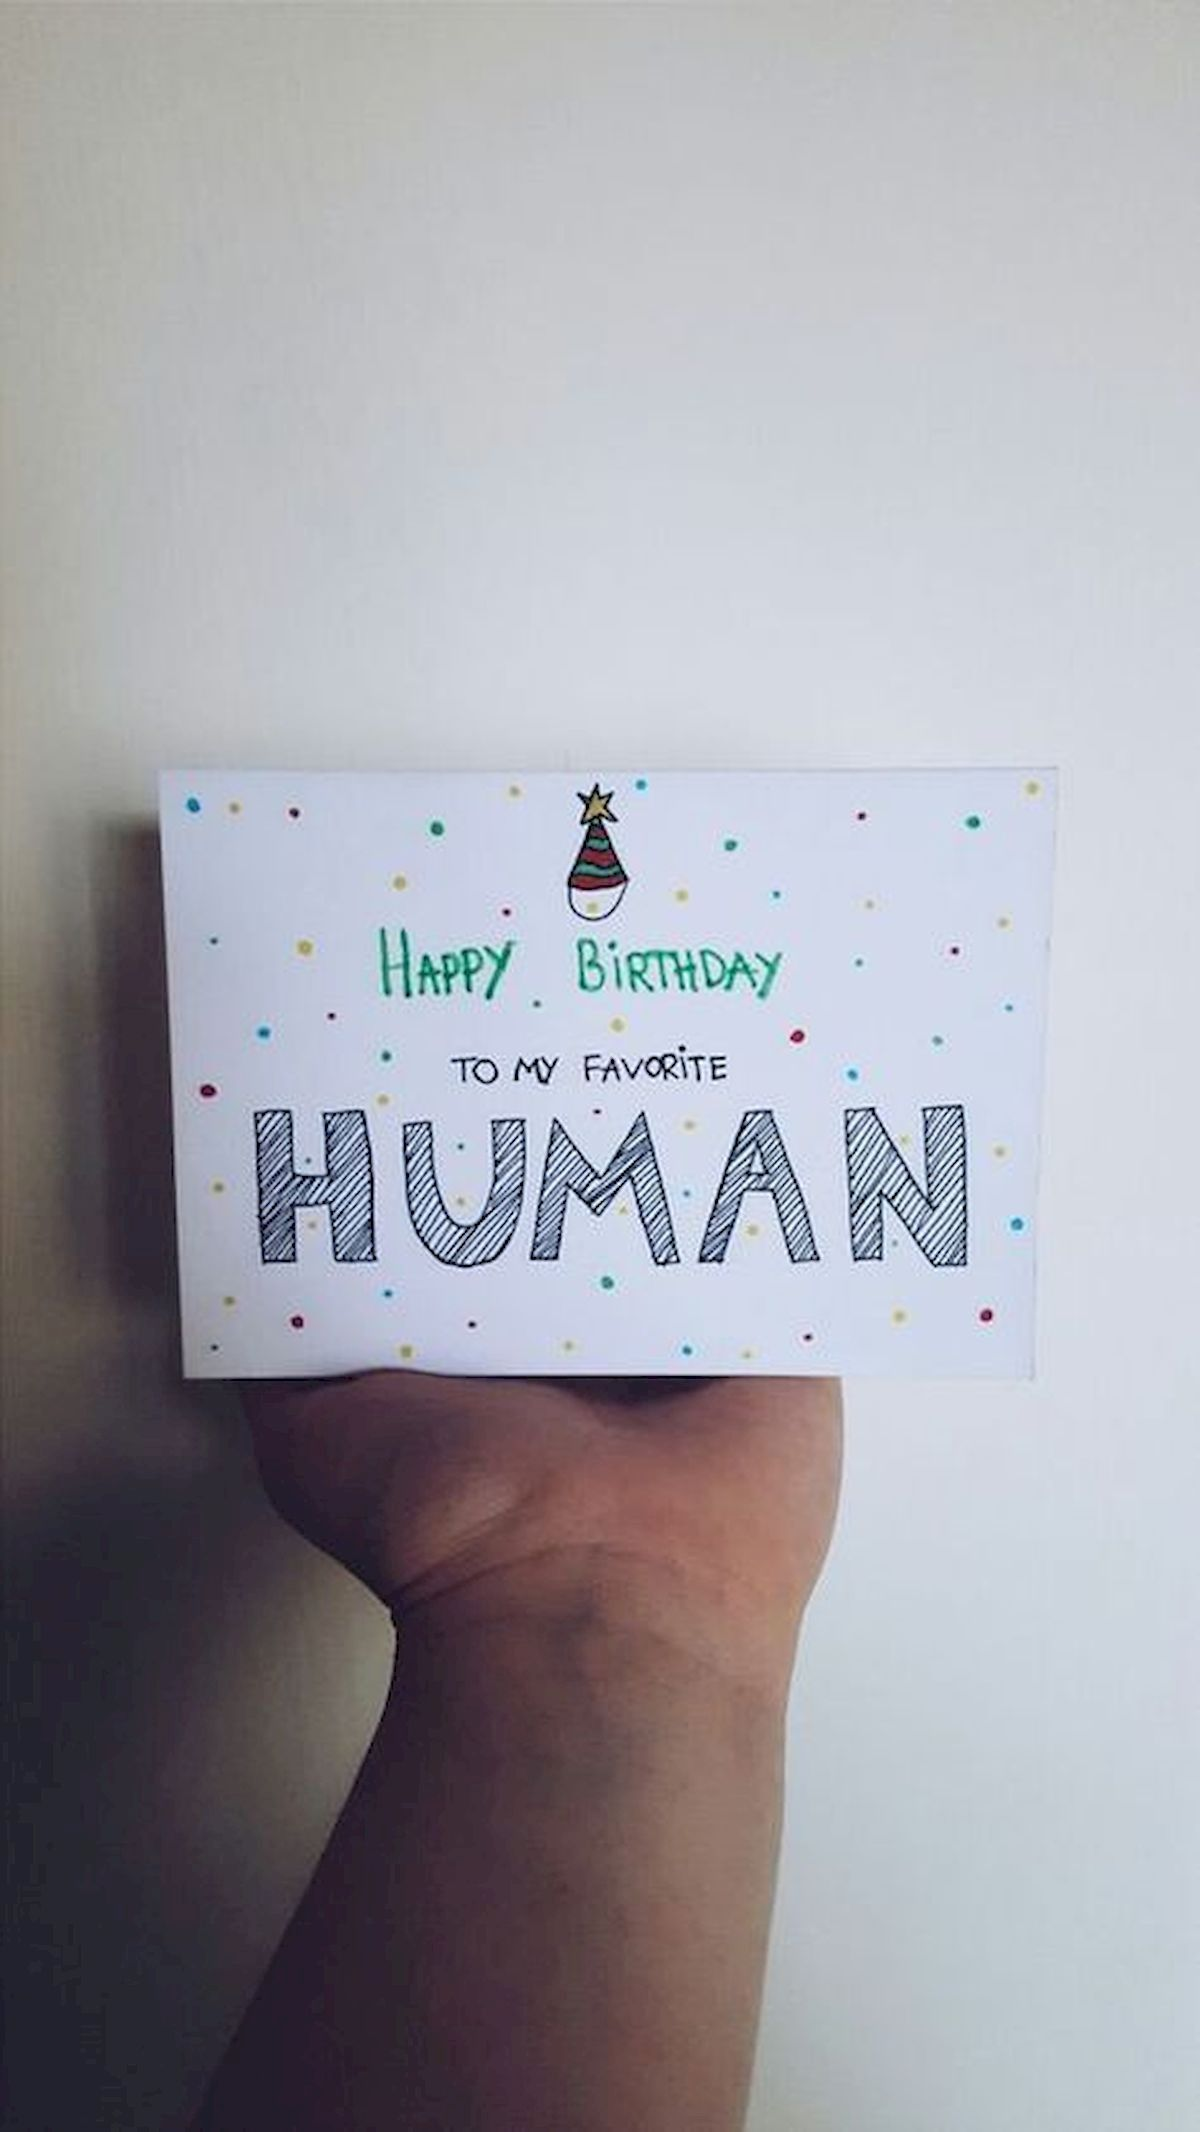 20 Best DIY Ideas for Boyfriend Birthday Birthday gifts